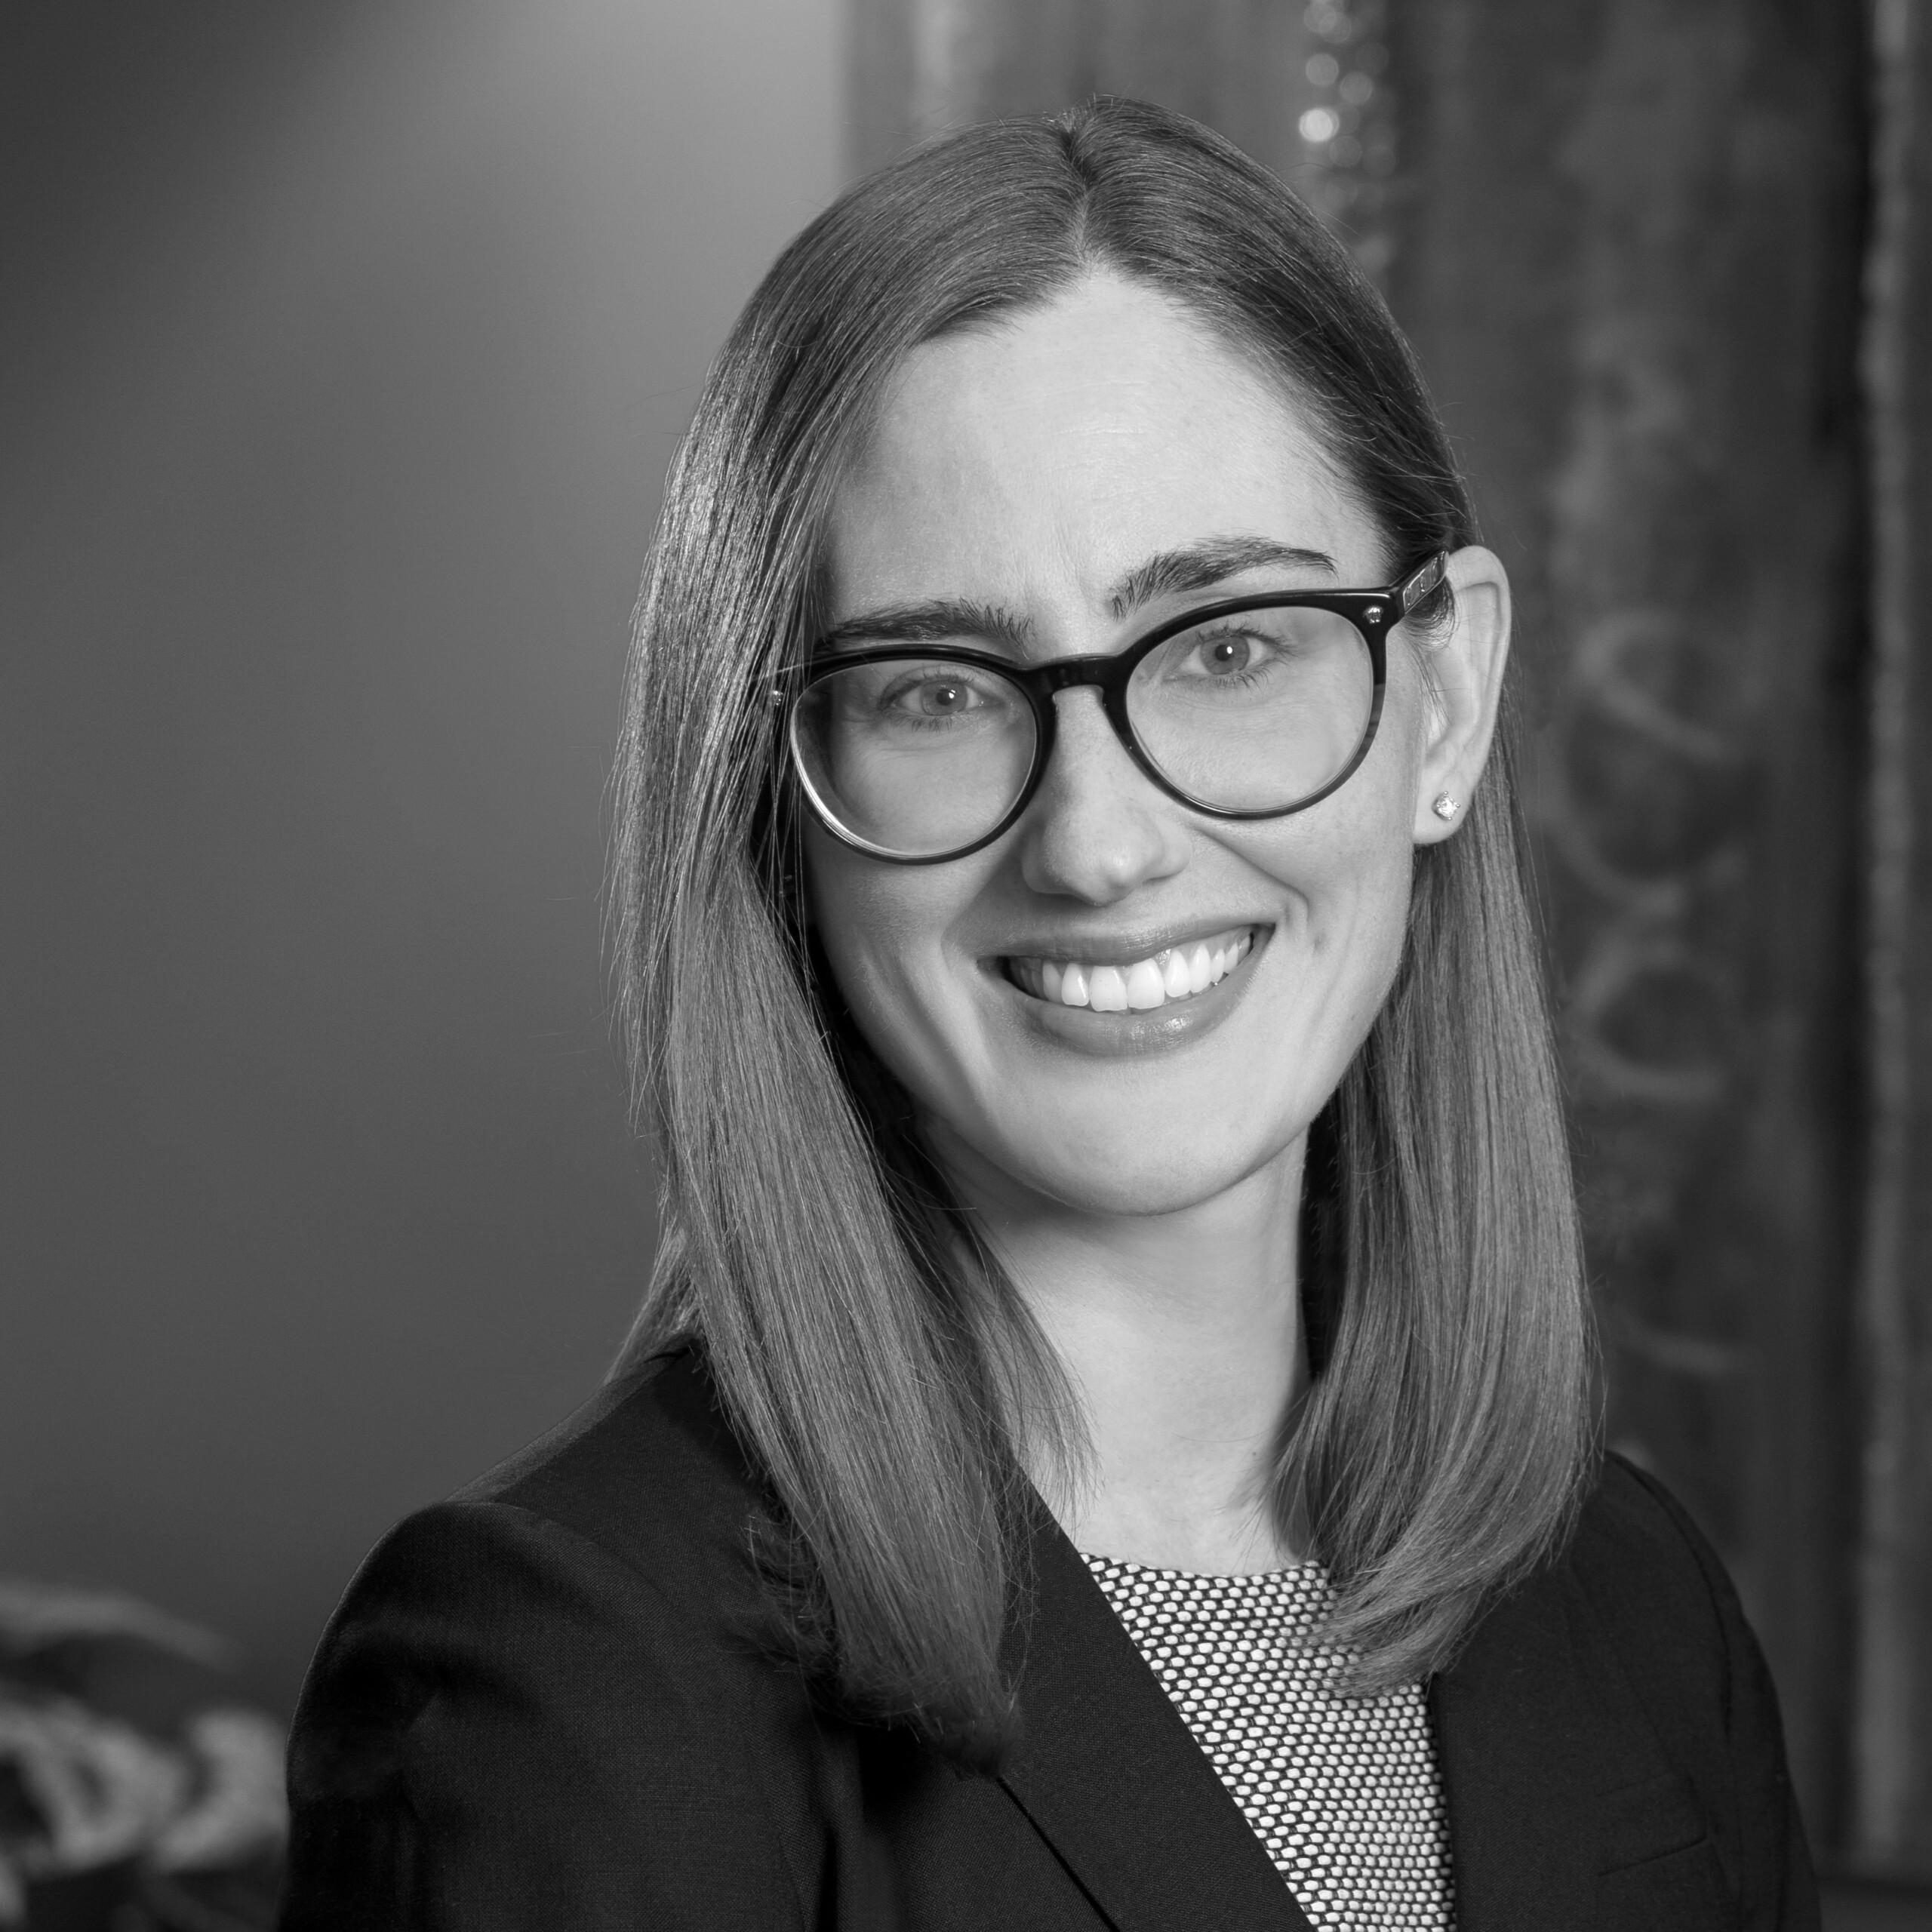 Dr. Katherine Voss